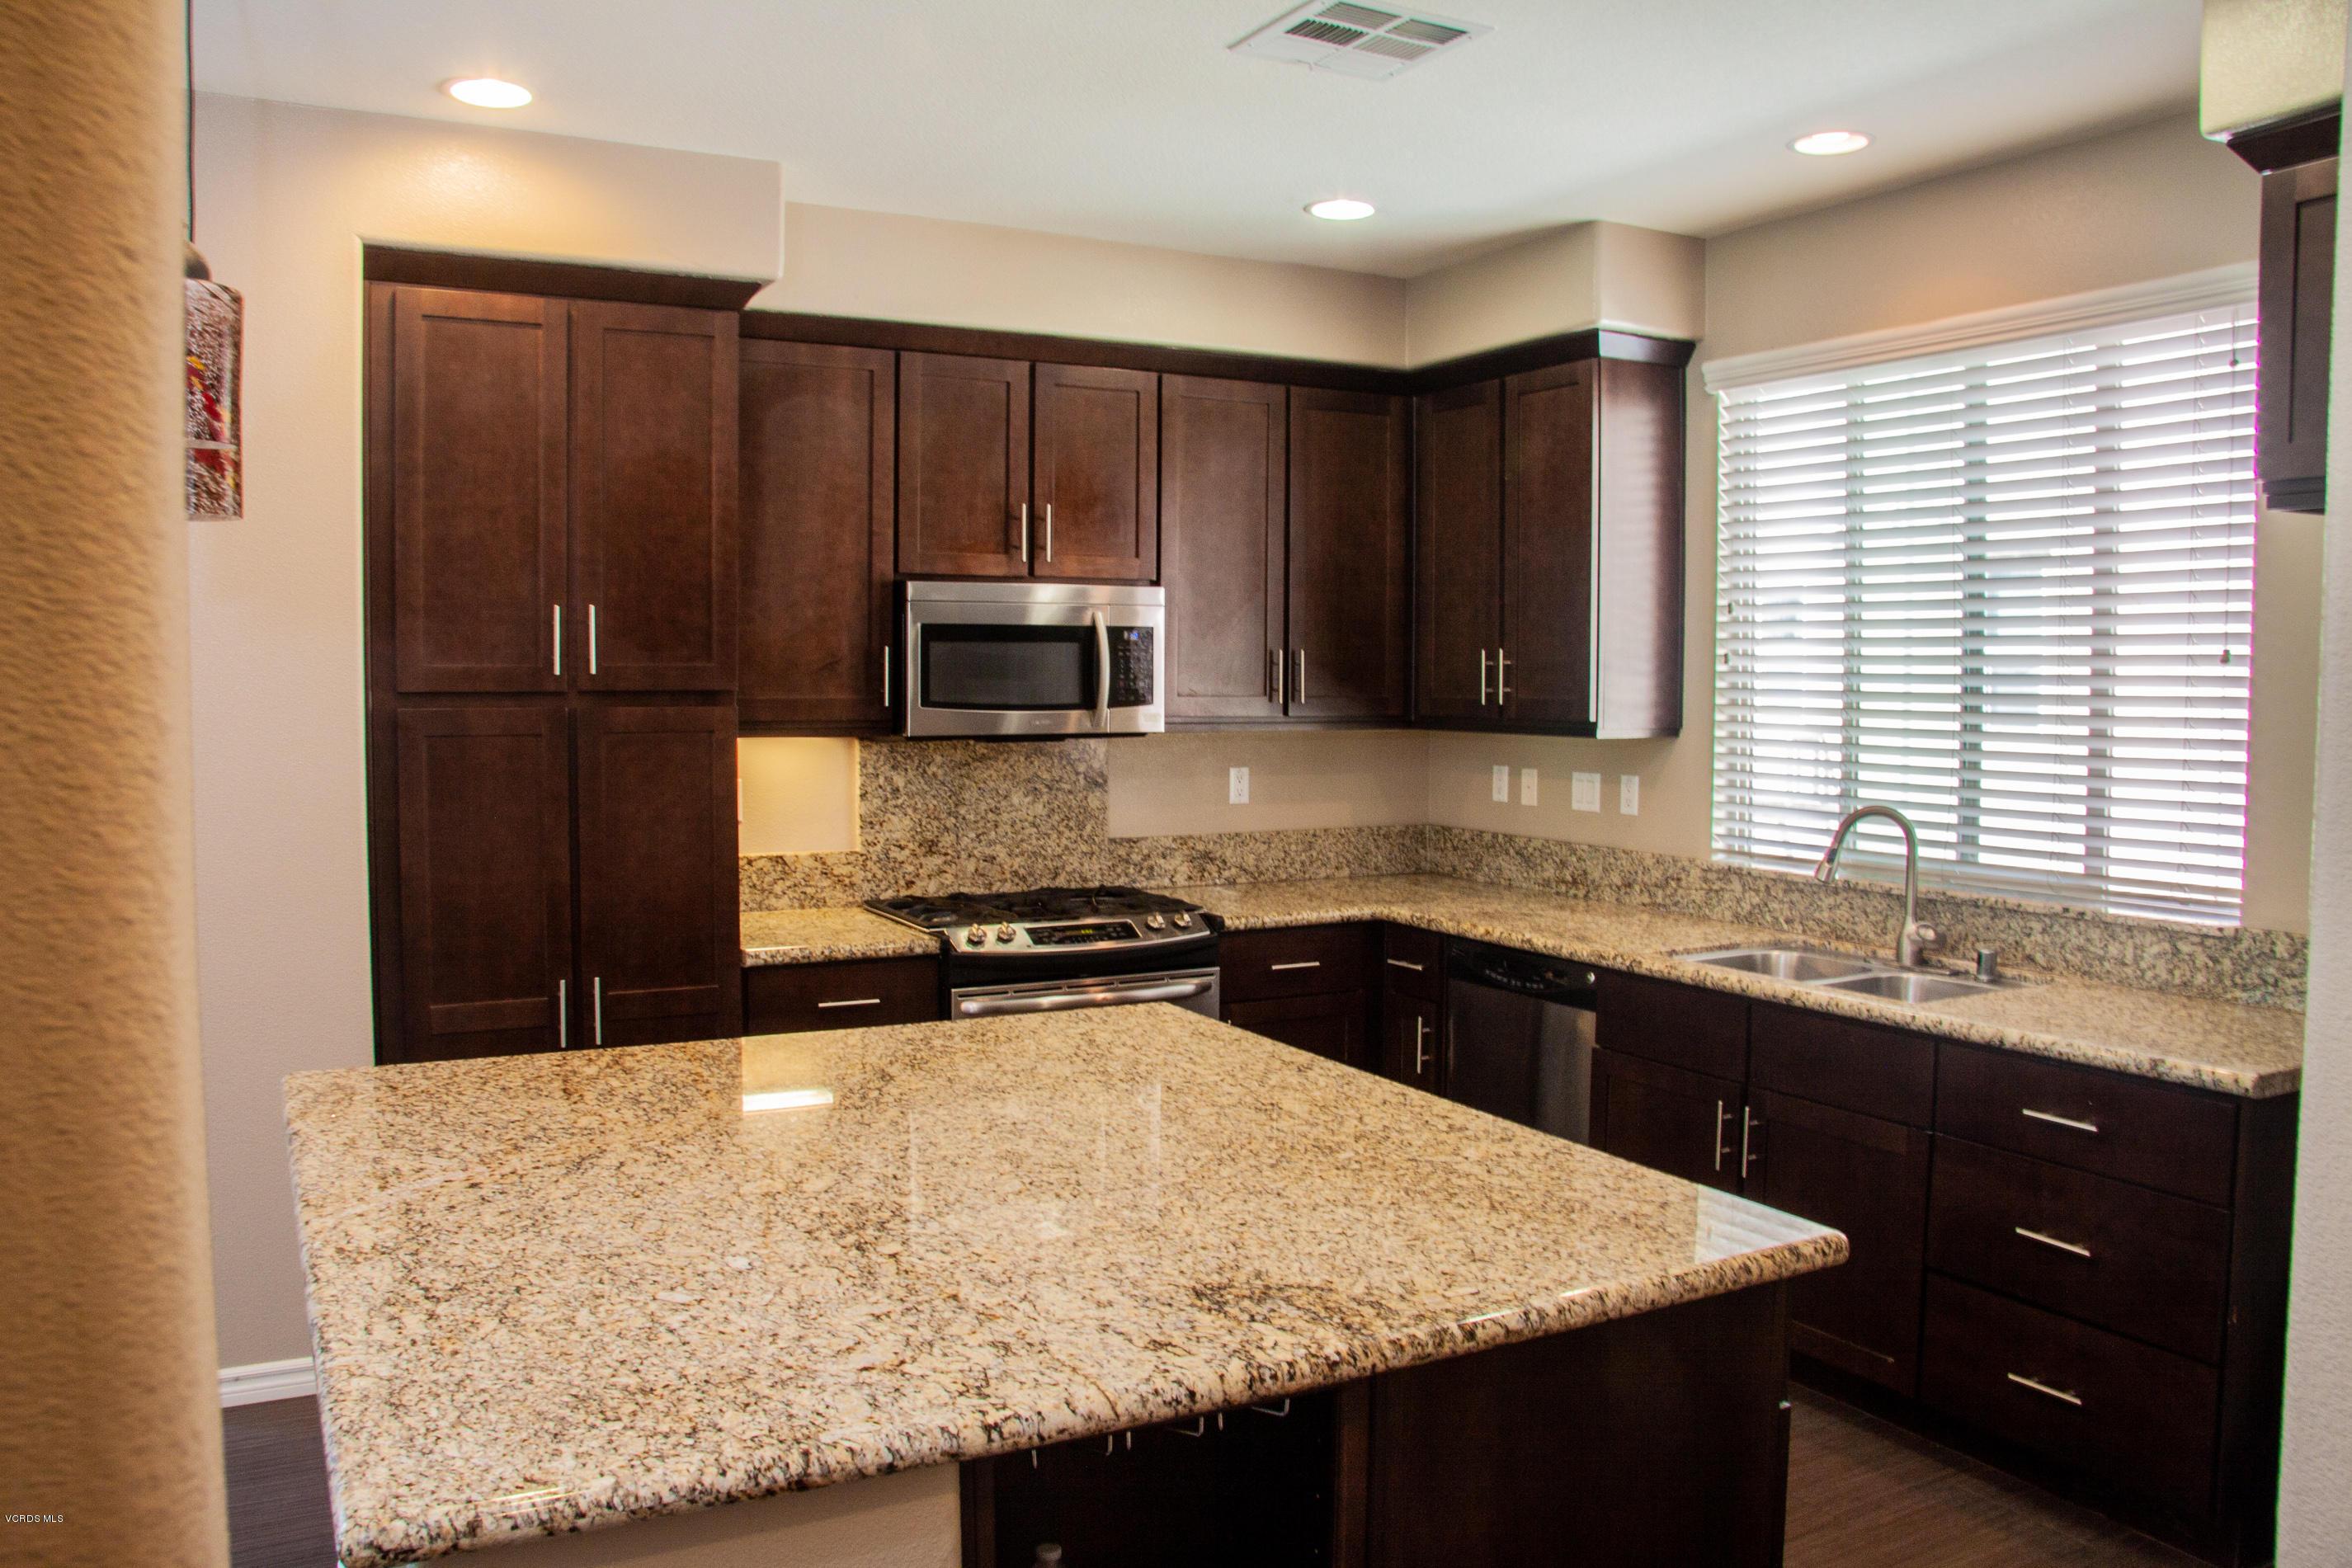 10820 Sonoma Lane Garden Grove California 92843 Condominium for Sale